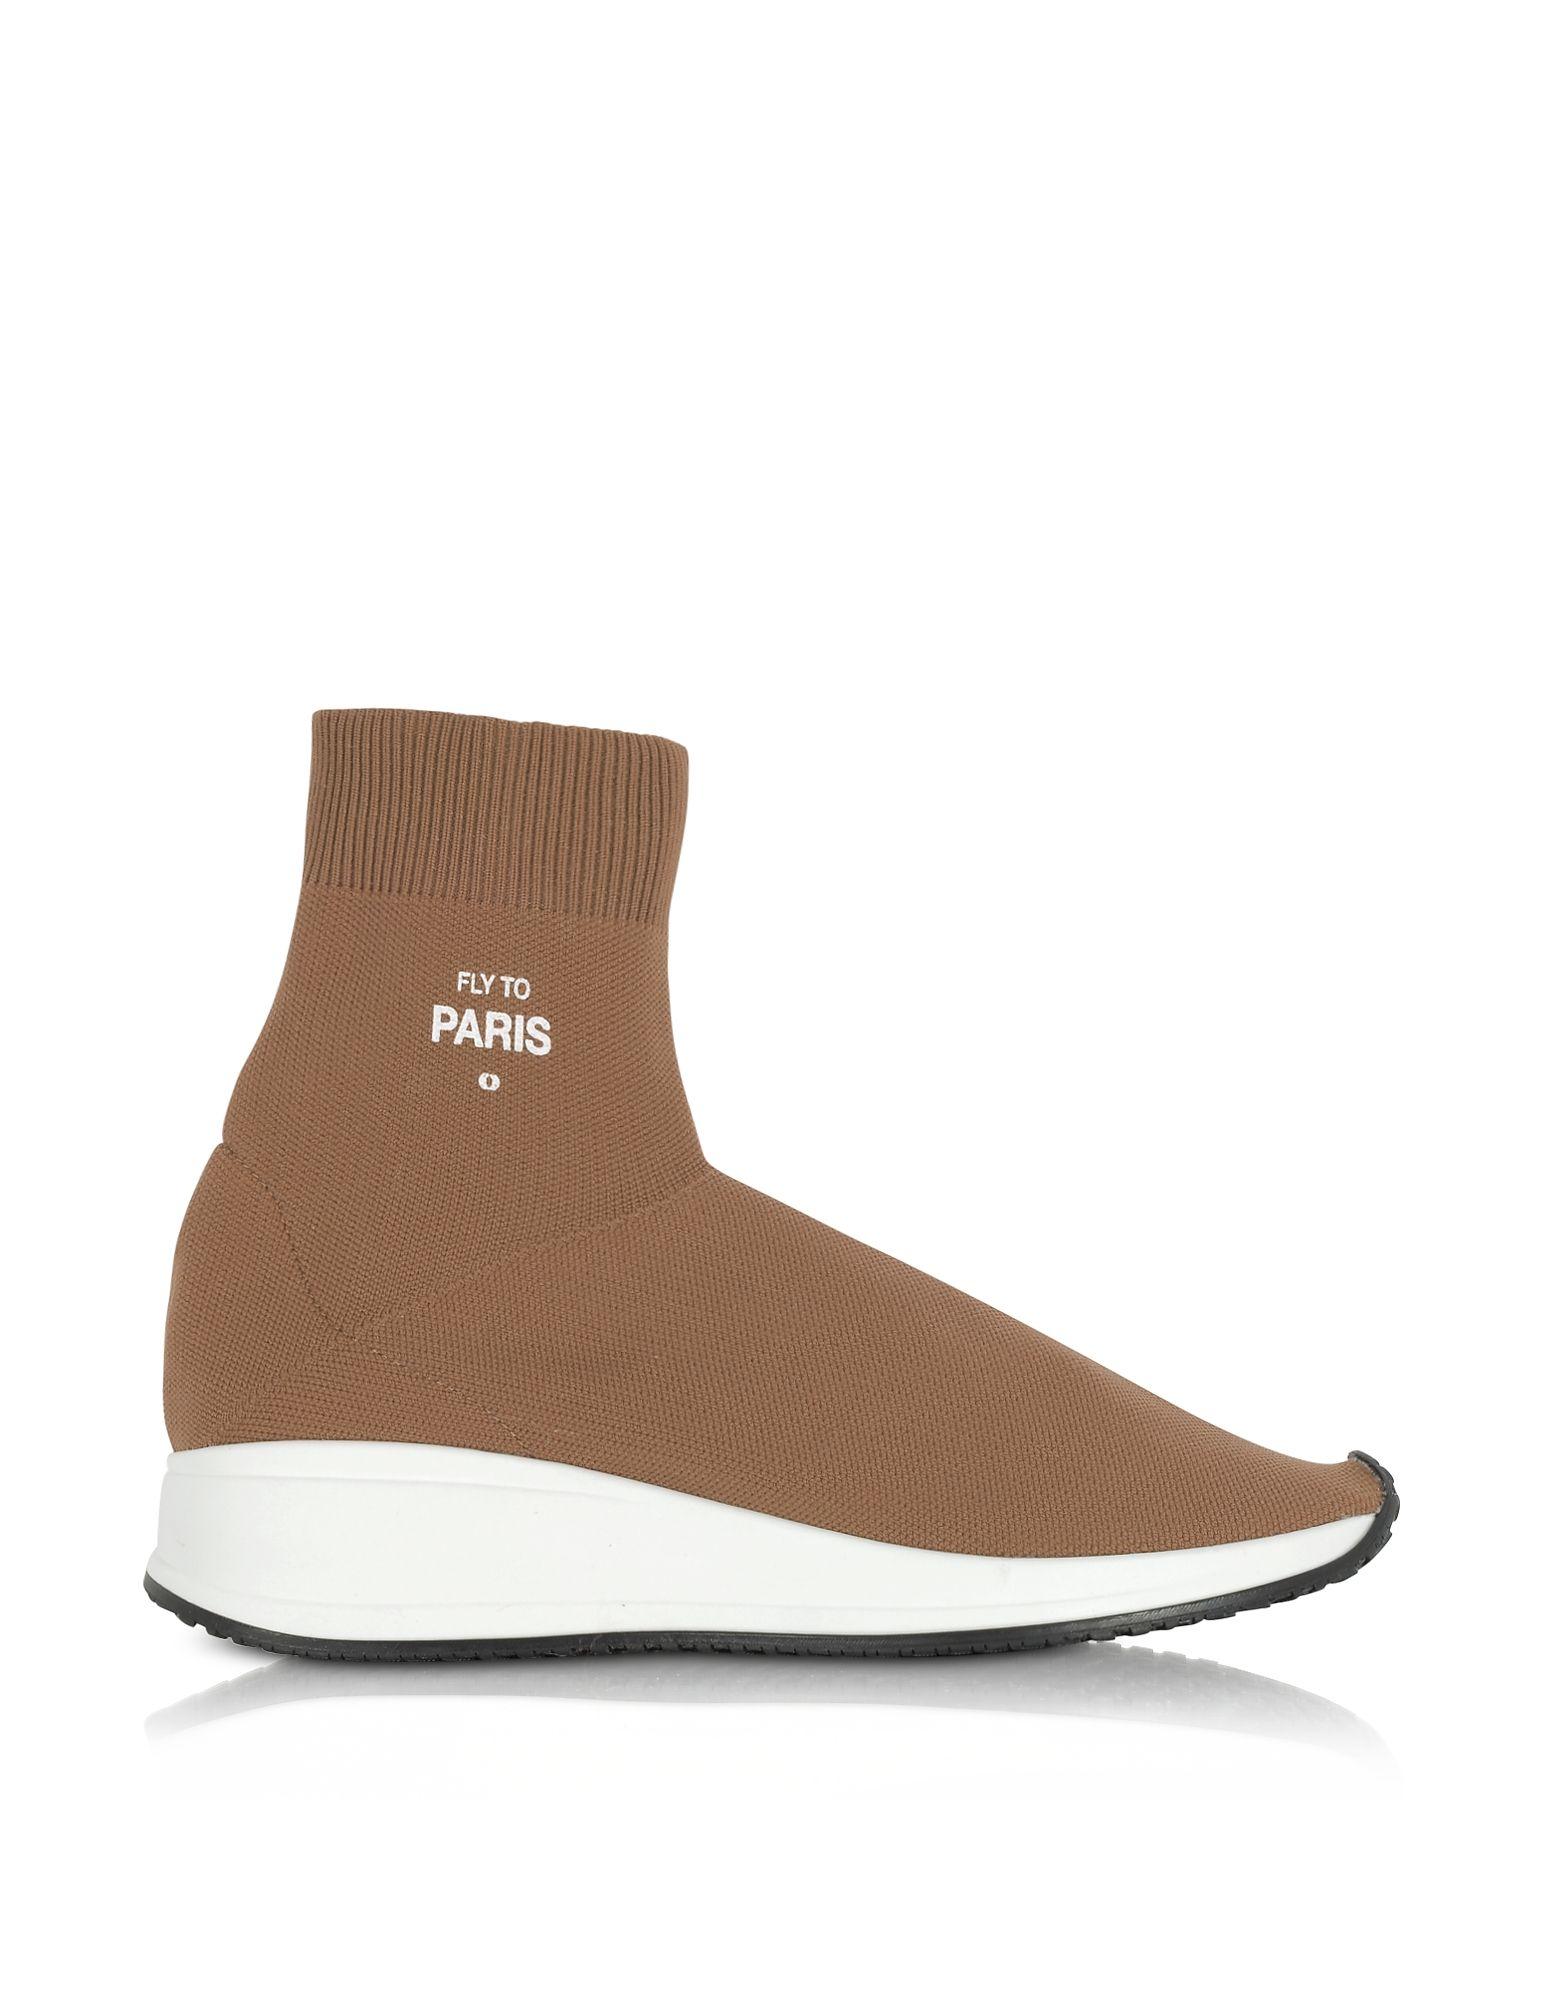 JOSHUA SANDERS Shoes, Fly To Paris Camel Nylon Sock Unisex Sneakers